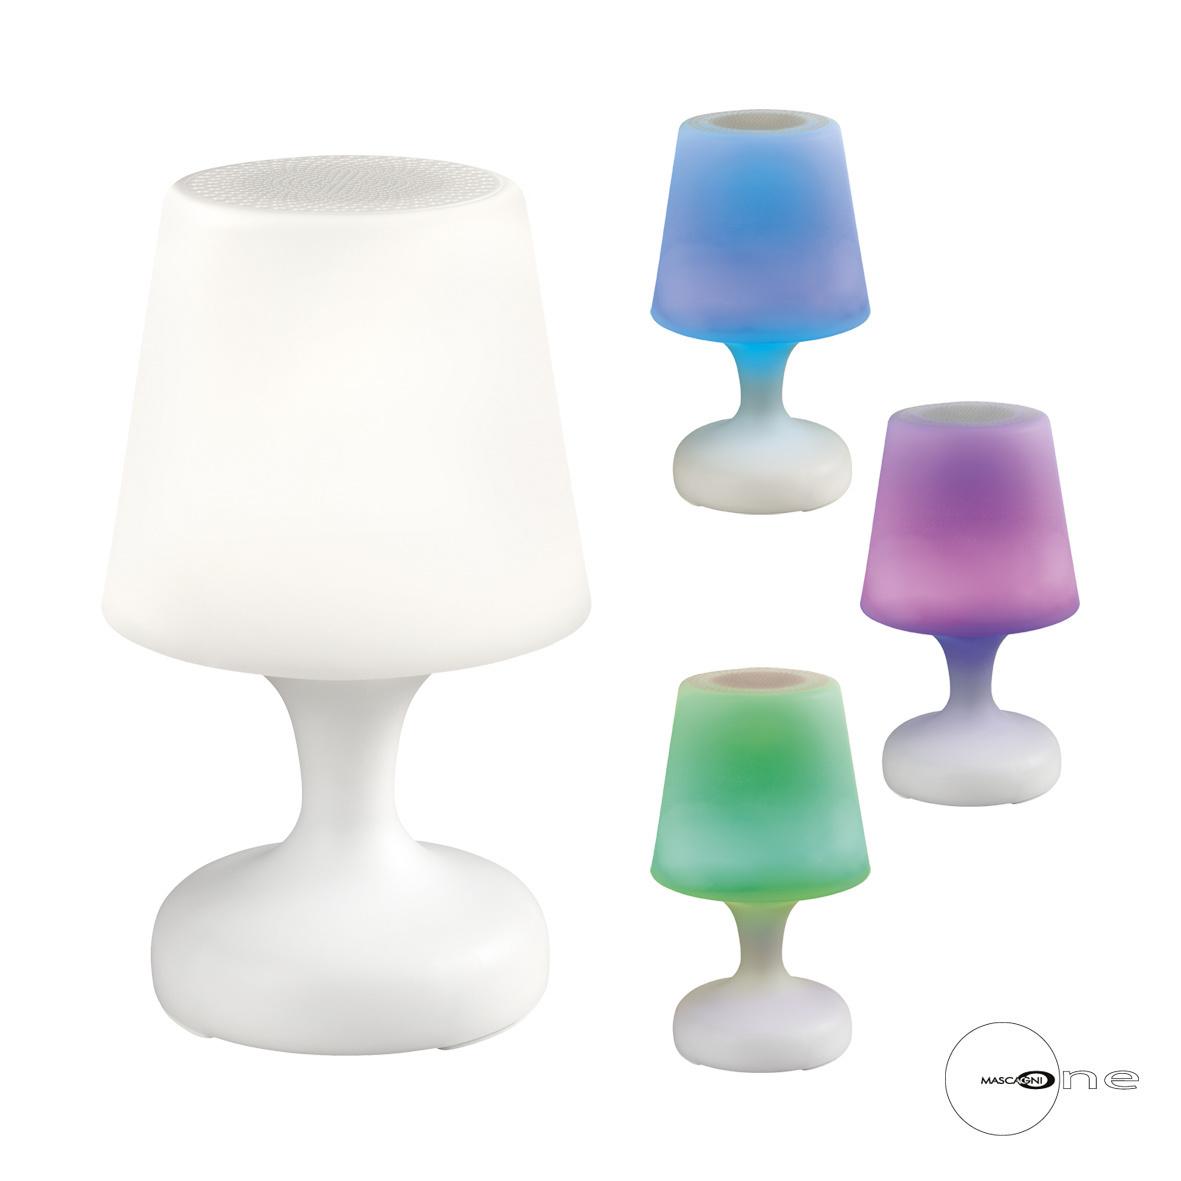 Art Mascagni O1395 LAMP WITH SPEAKER